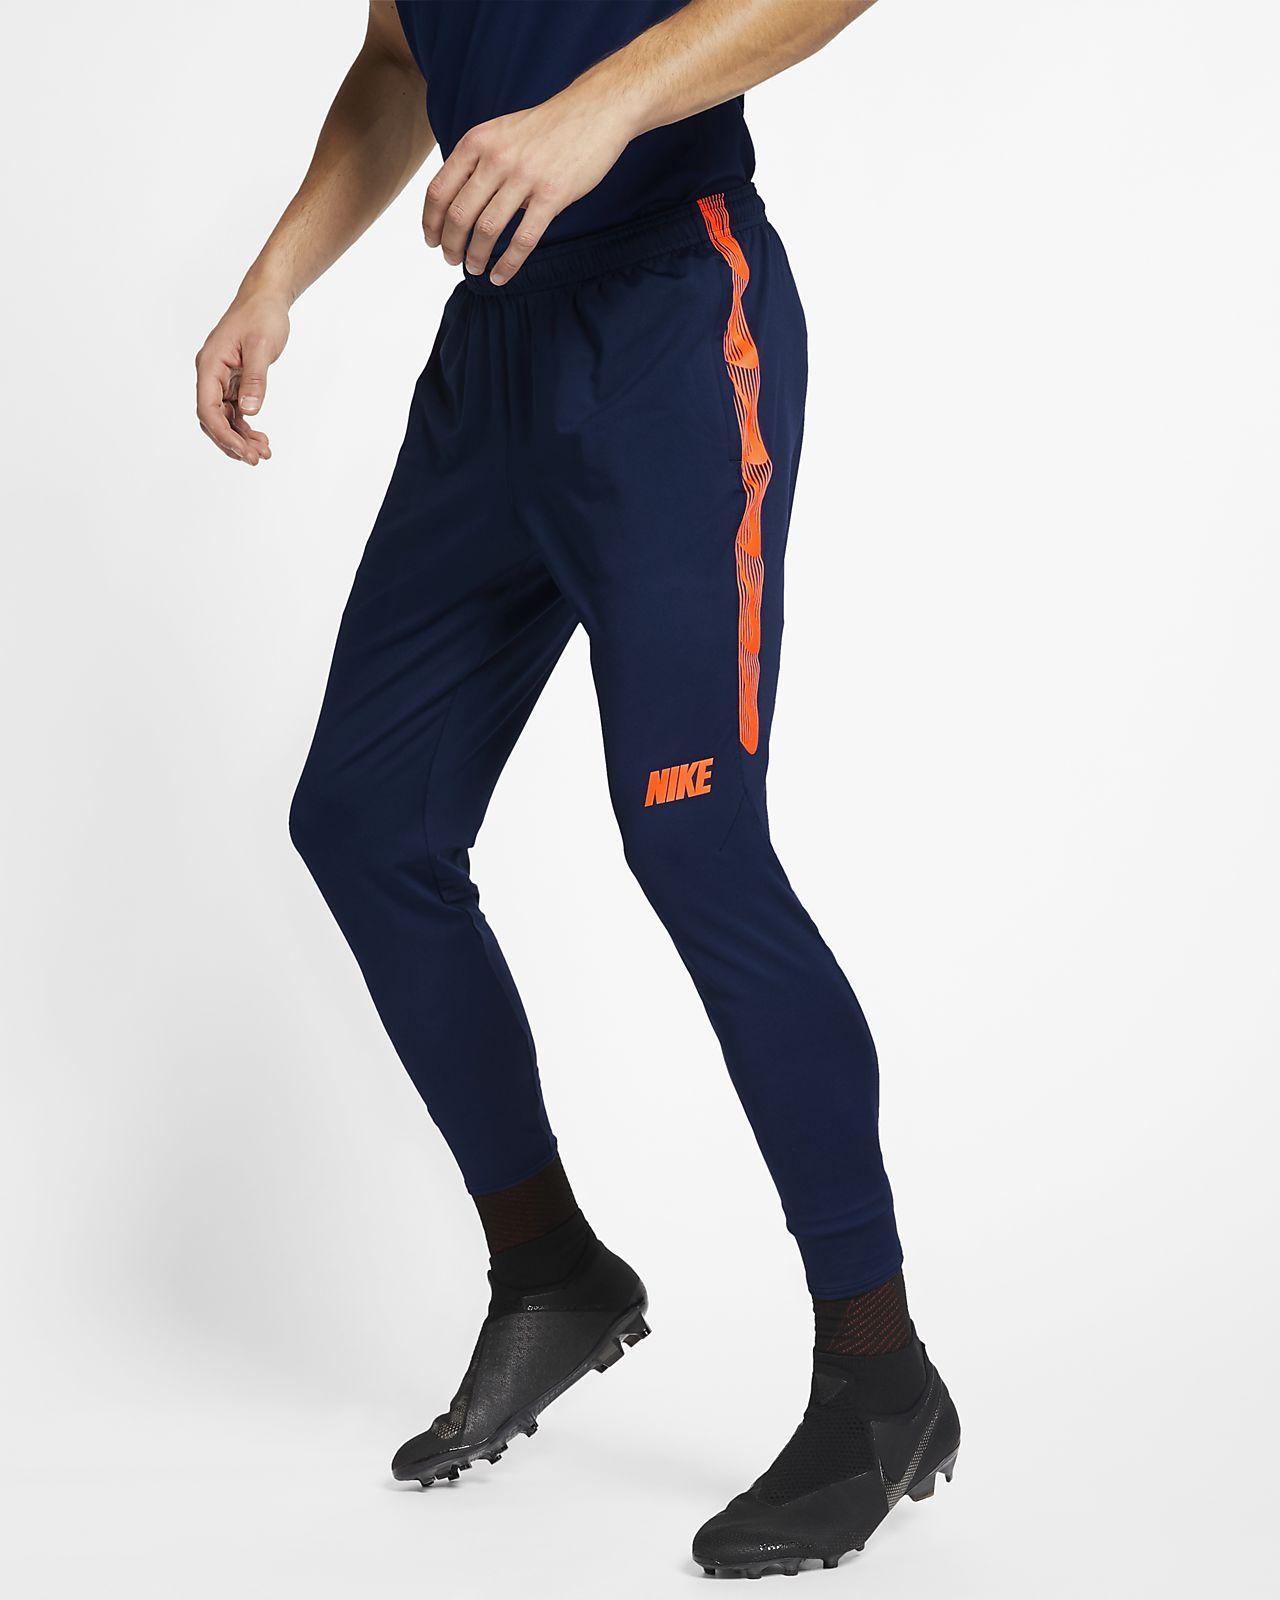 9704fc923c9885 Nike Dri-FIT Squad Herren-Fußballhose. Nike.com AT